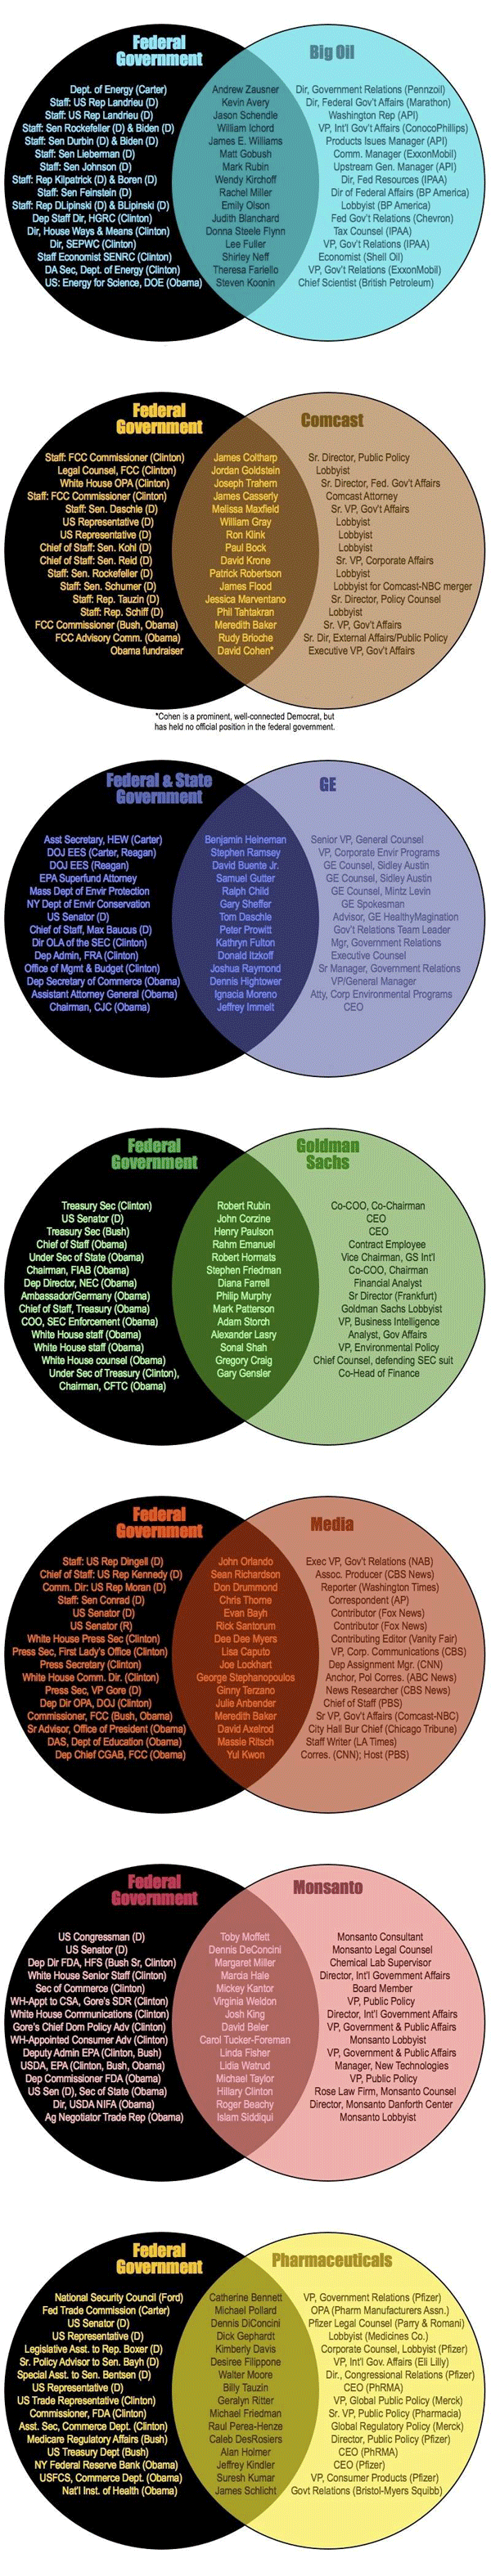 Crony Capitalism | Original by Stephanie Herman posted to lewrockwell.com/blog